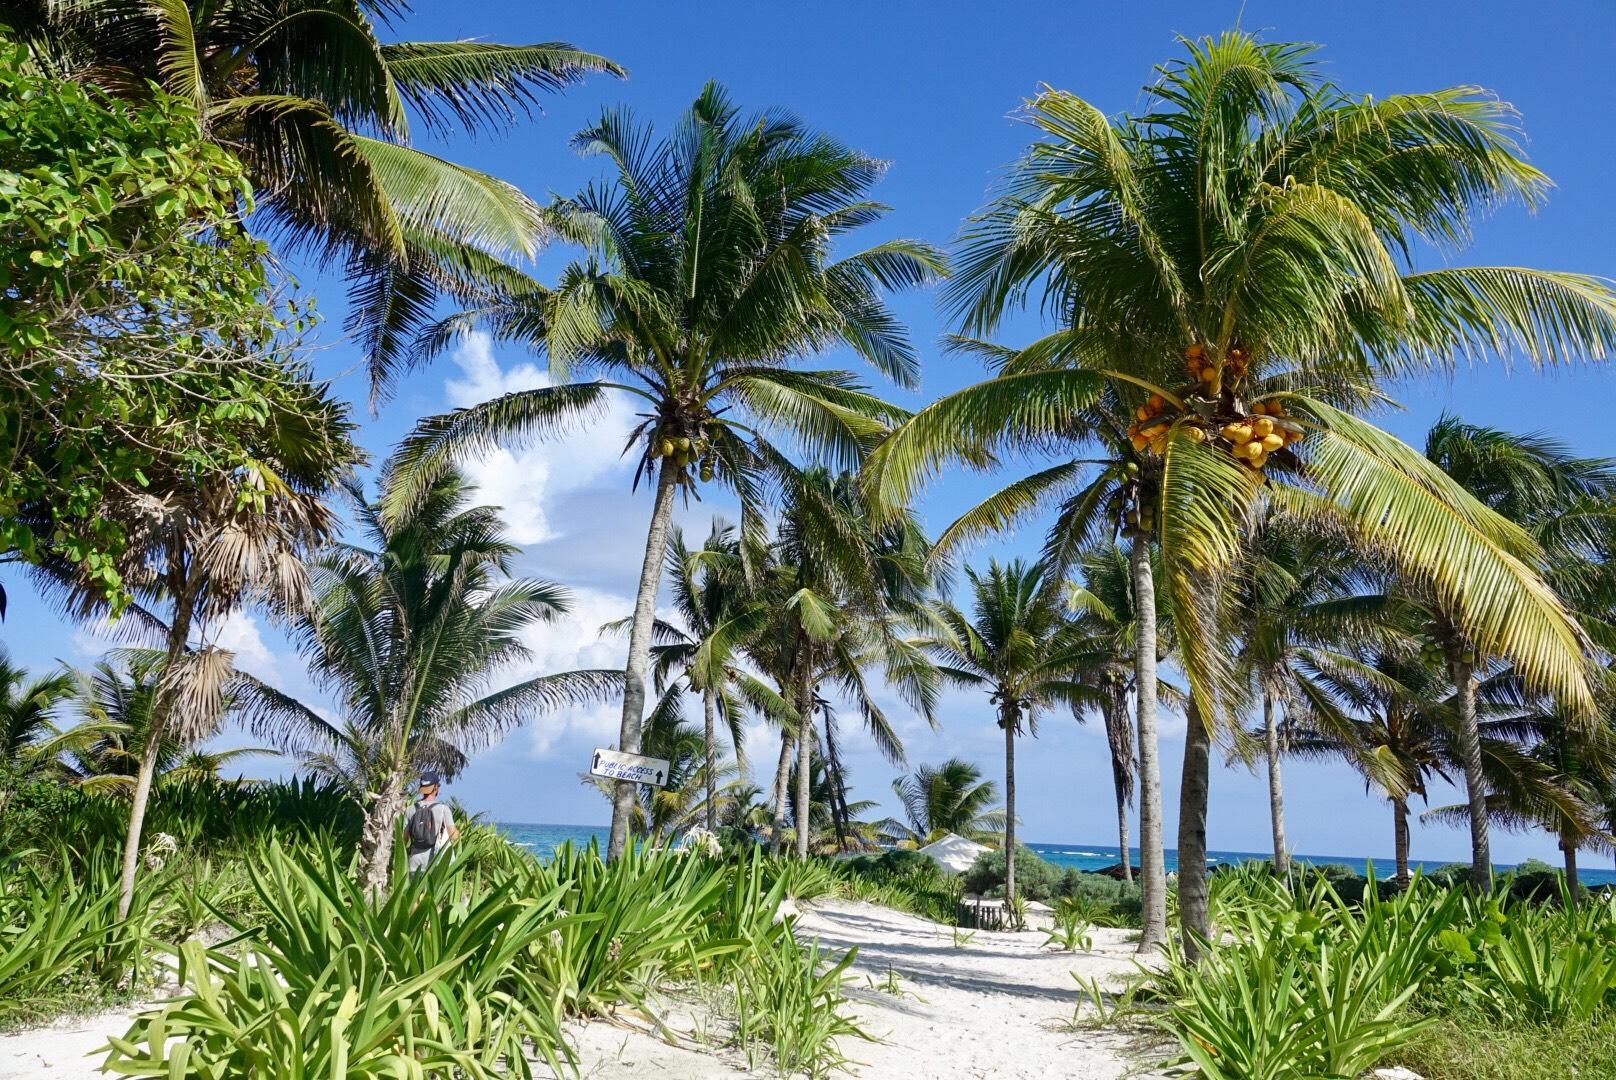 plages de tulum